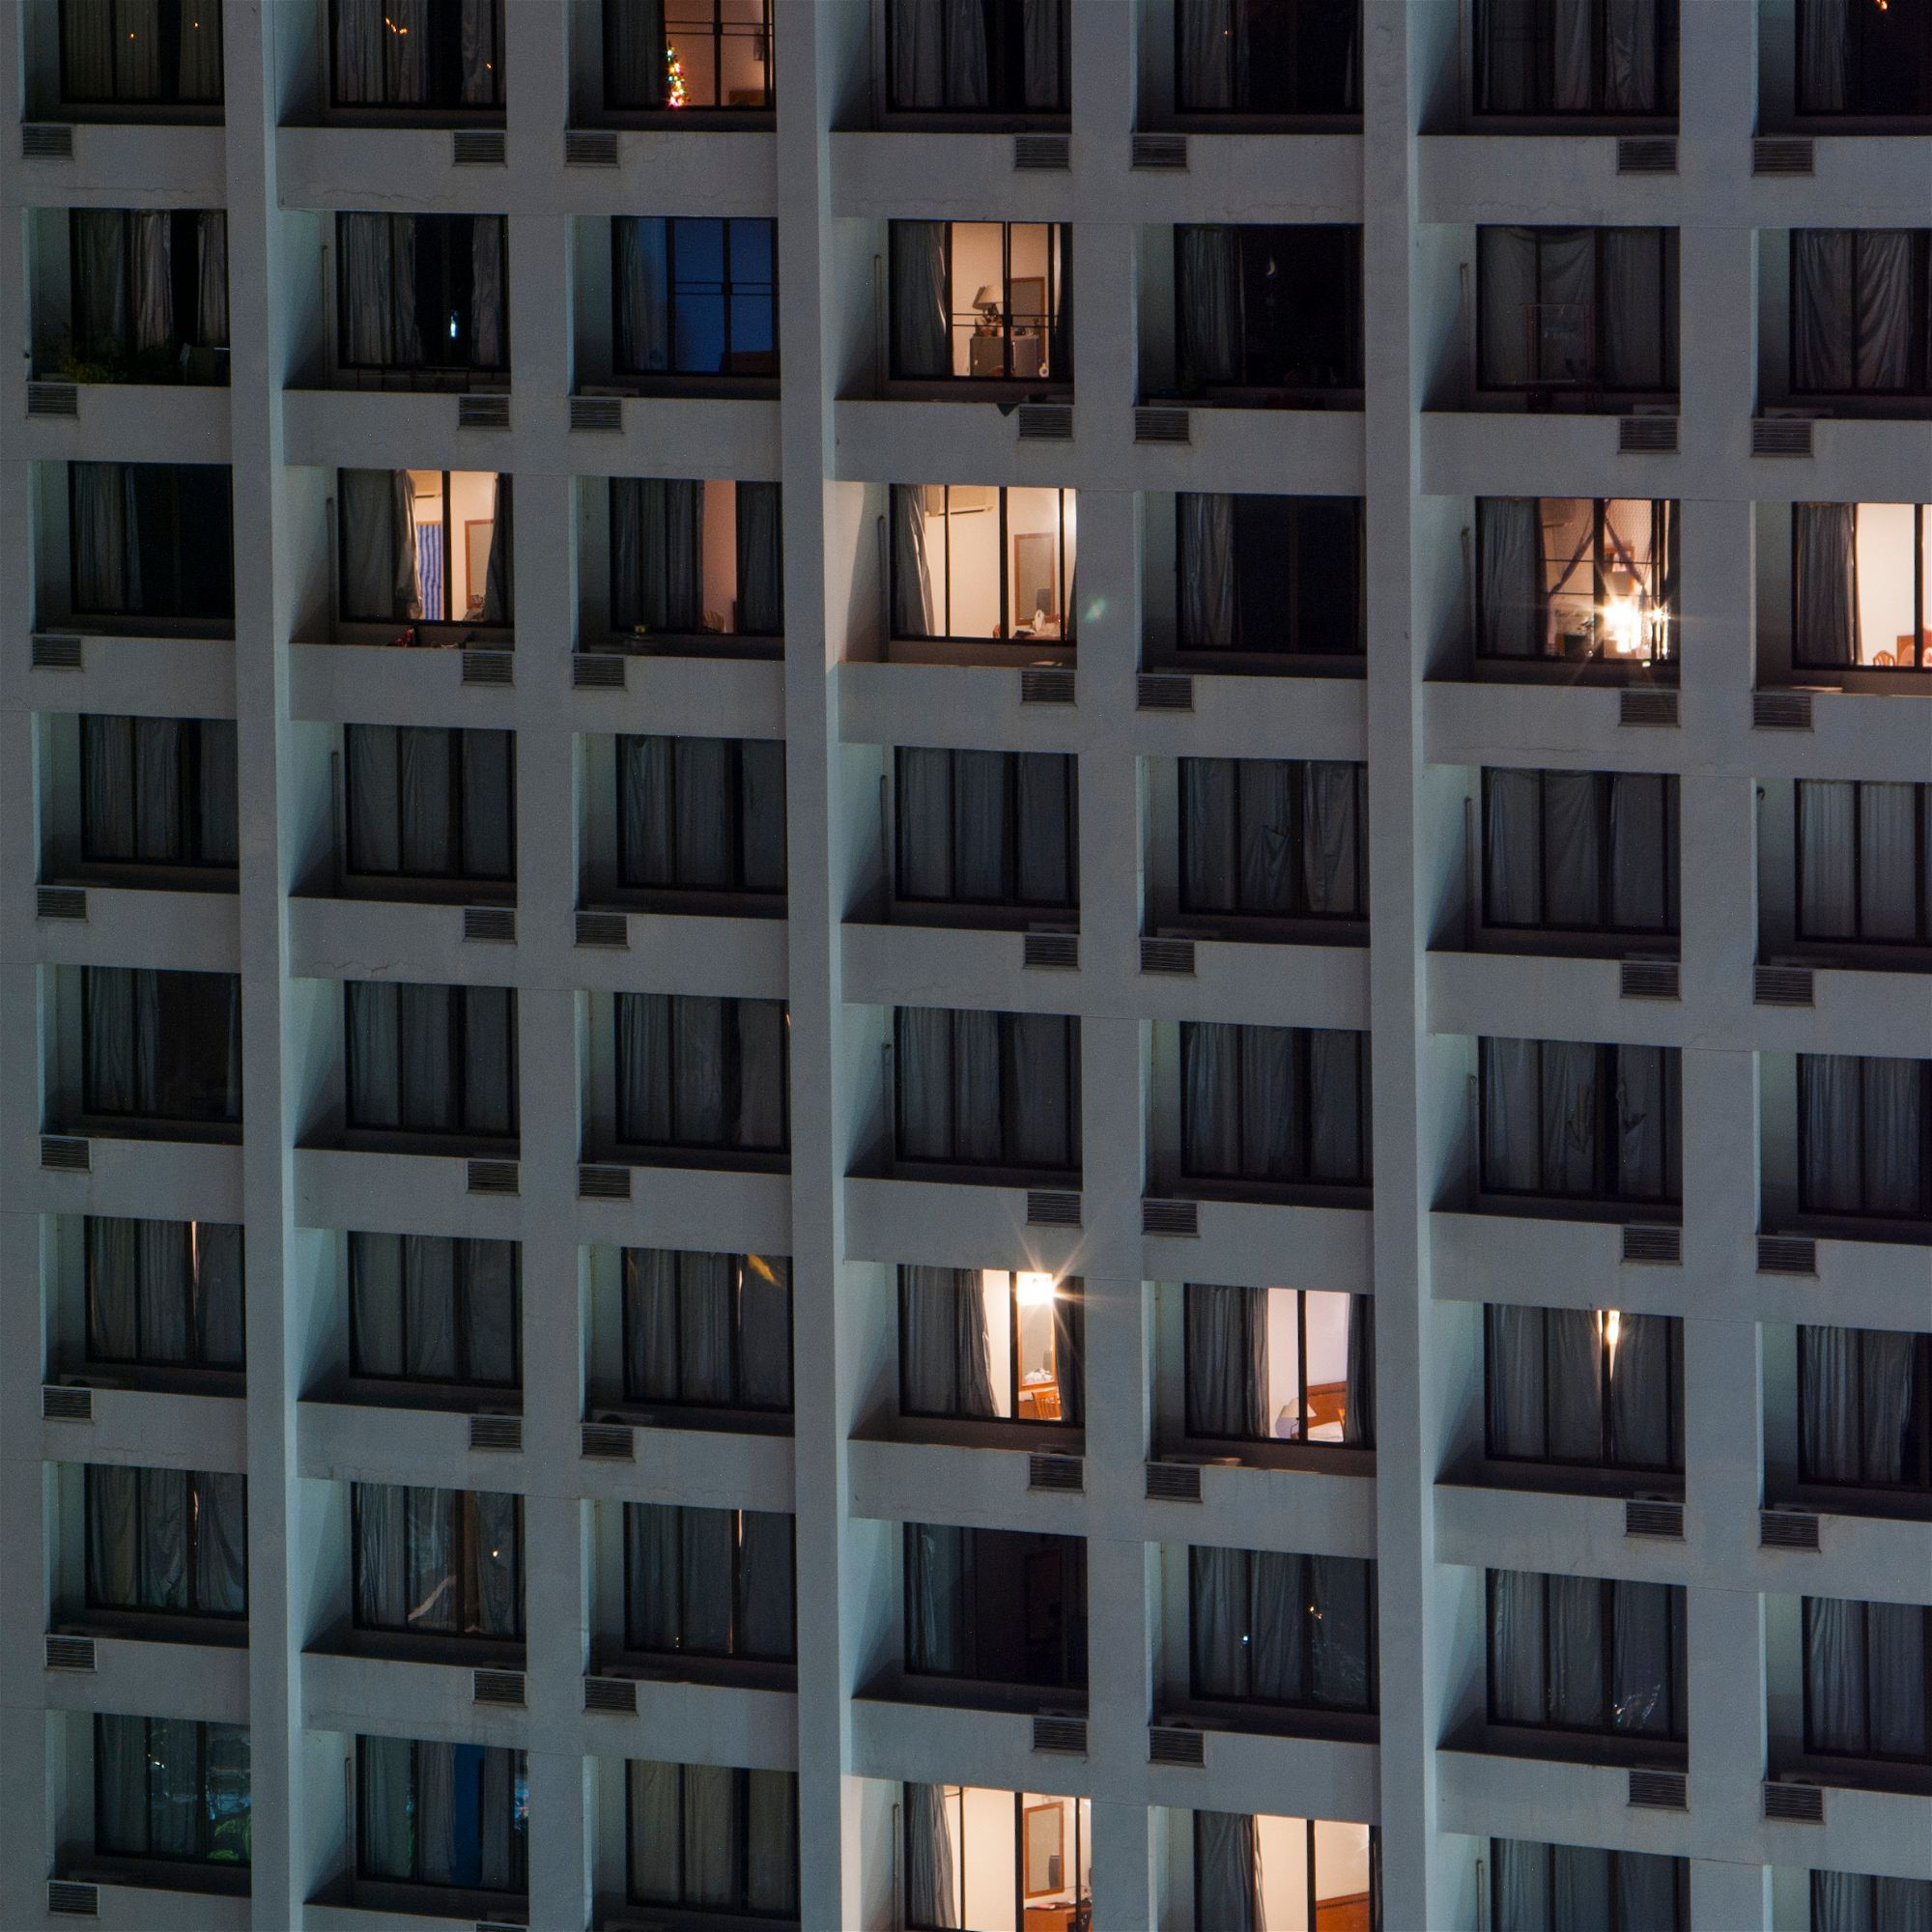 Hitze-Regeln: Bloß kein Dauerlüften im Keller - Finanztrends